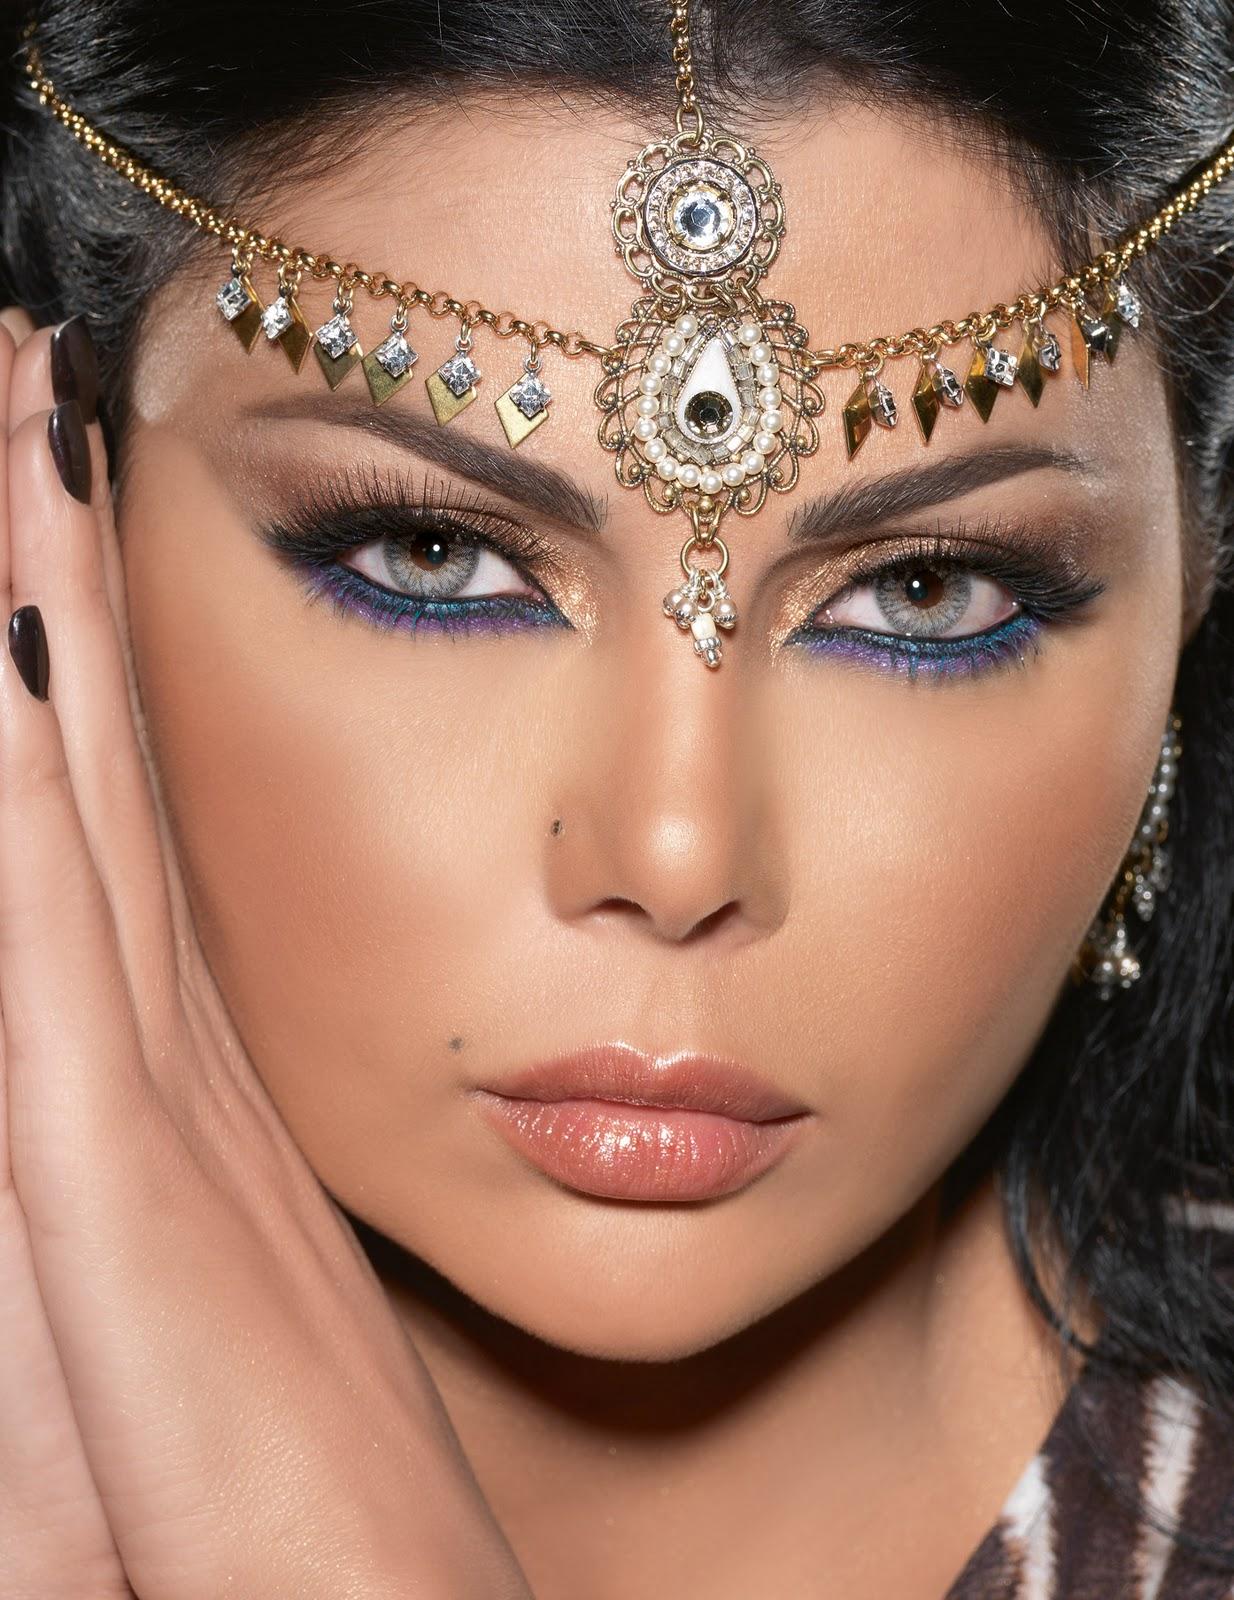 Celebrity photo haifa wehbe haifa wehbe photo 505764 20 vote